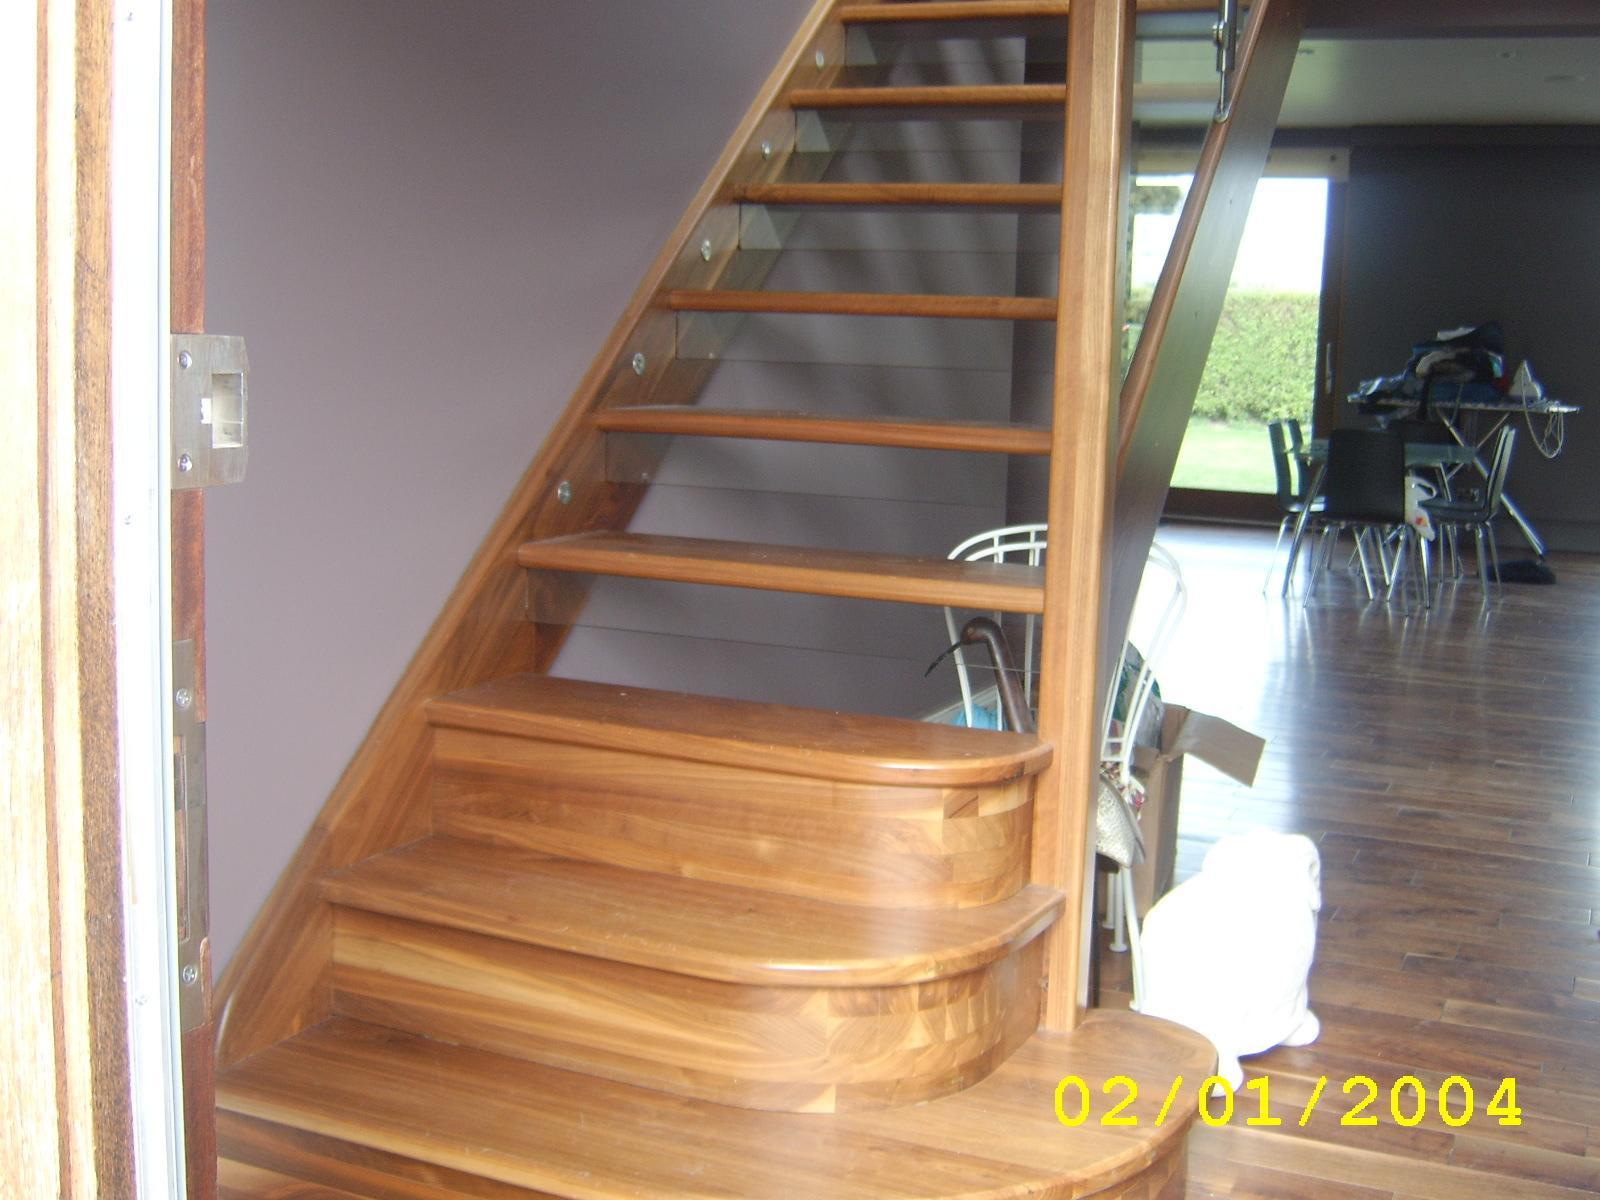 L F Gray Stairmakers Ltd